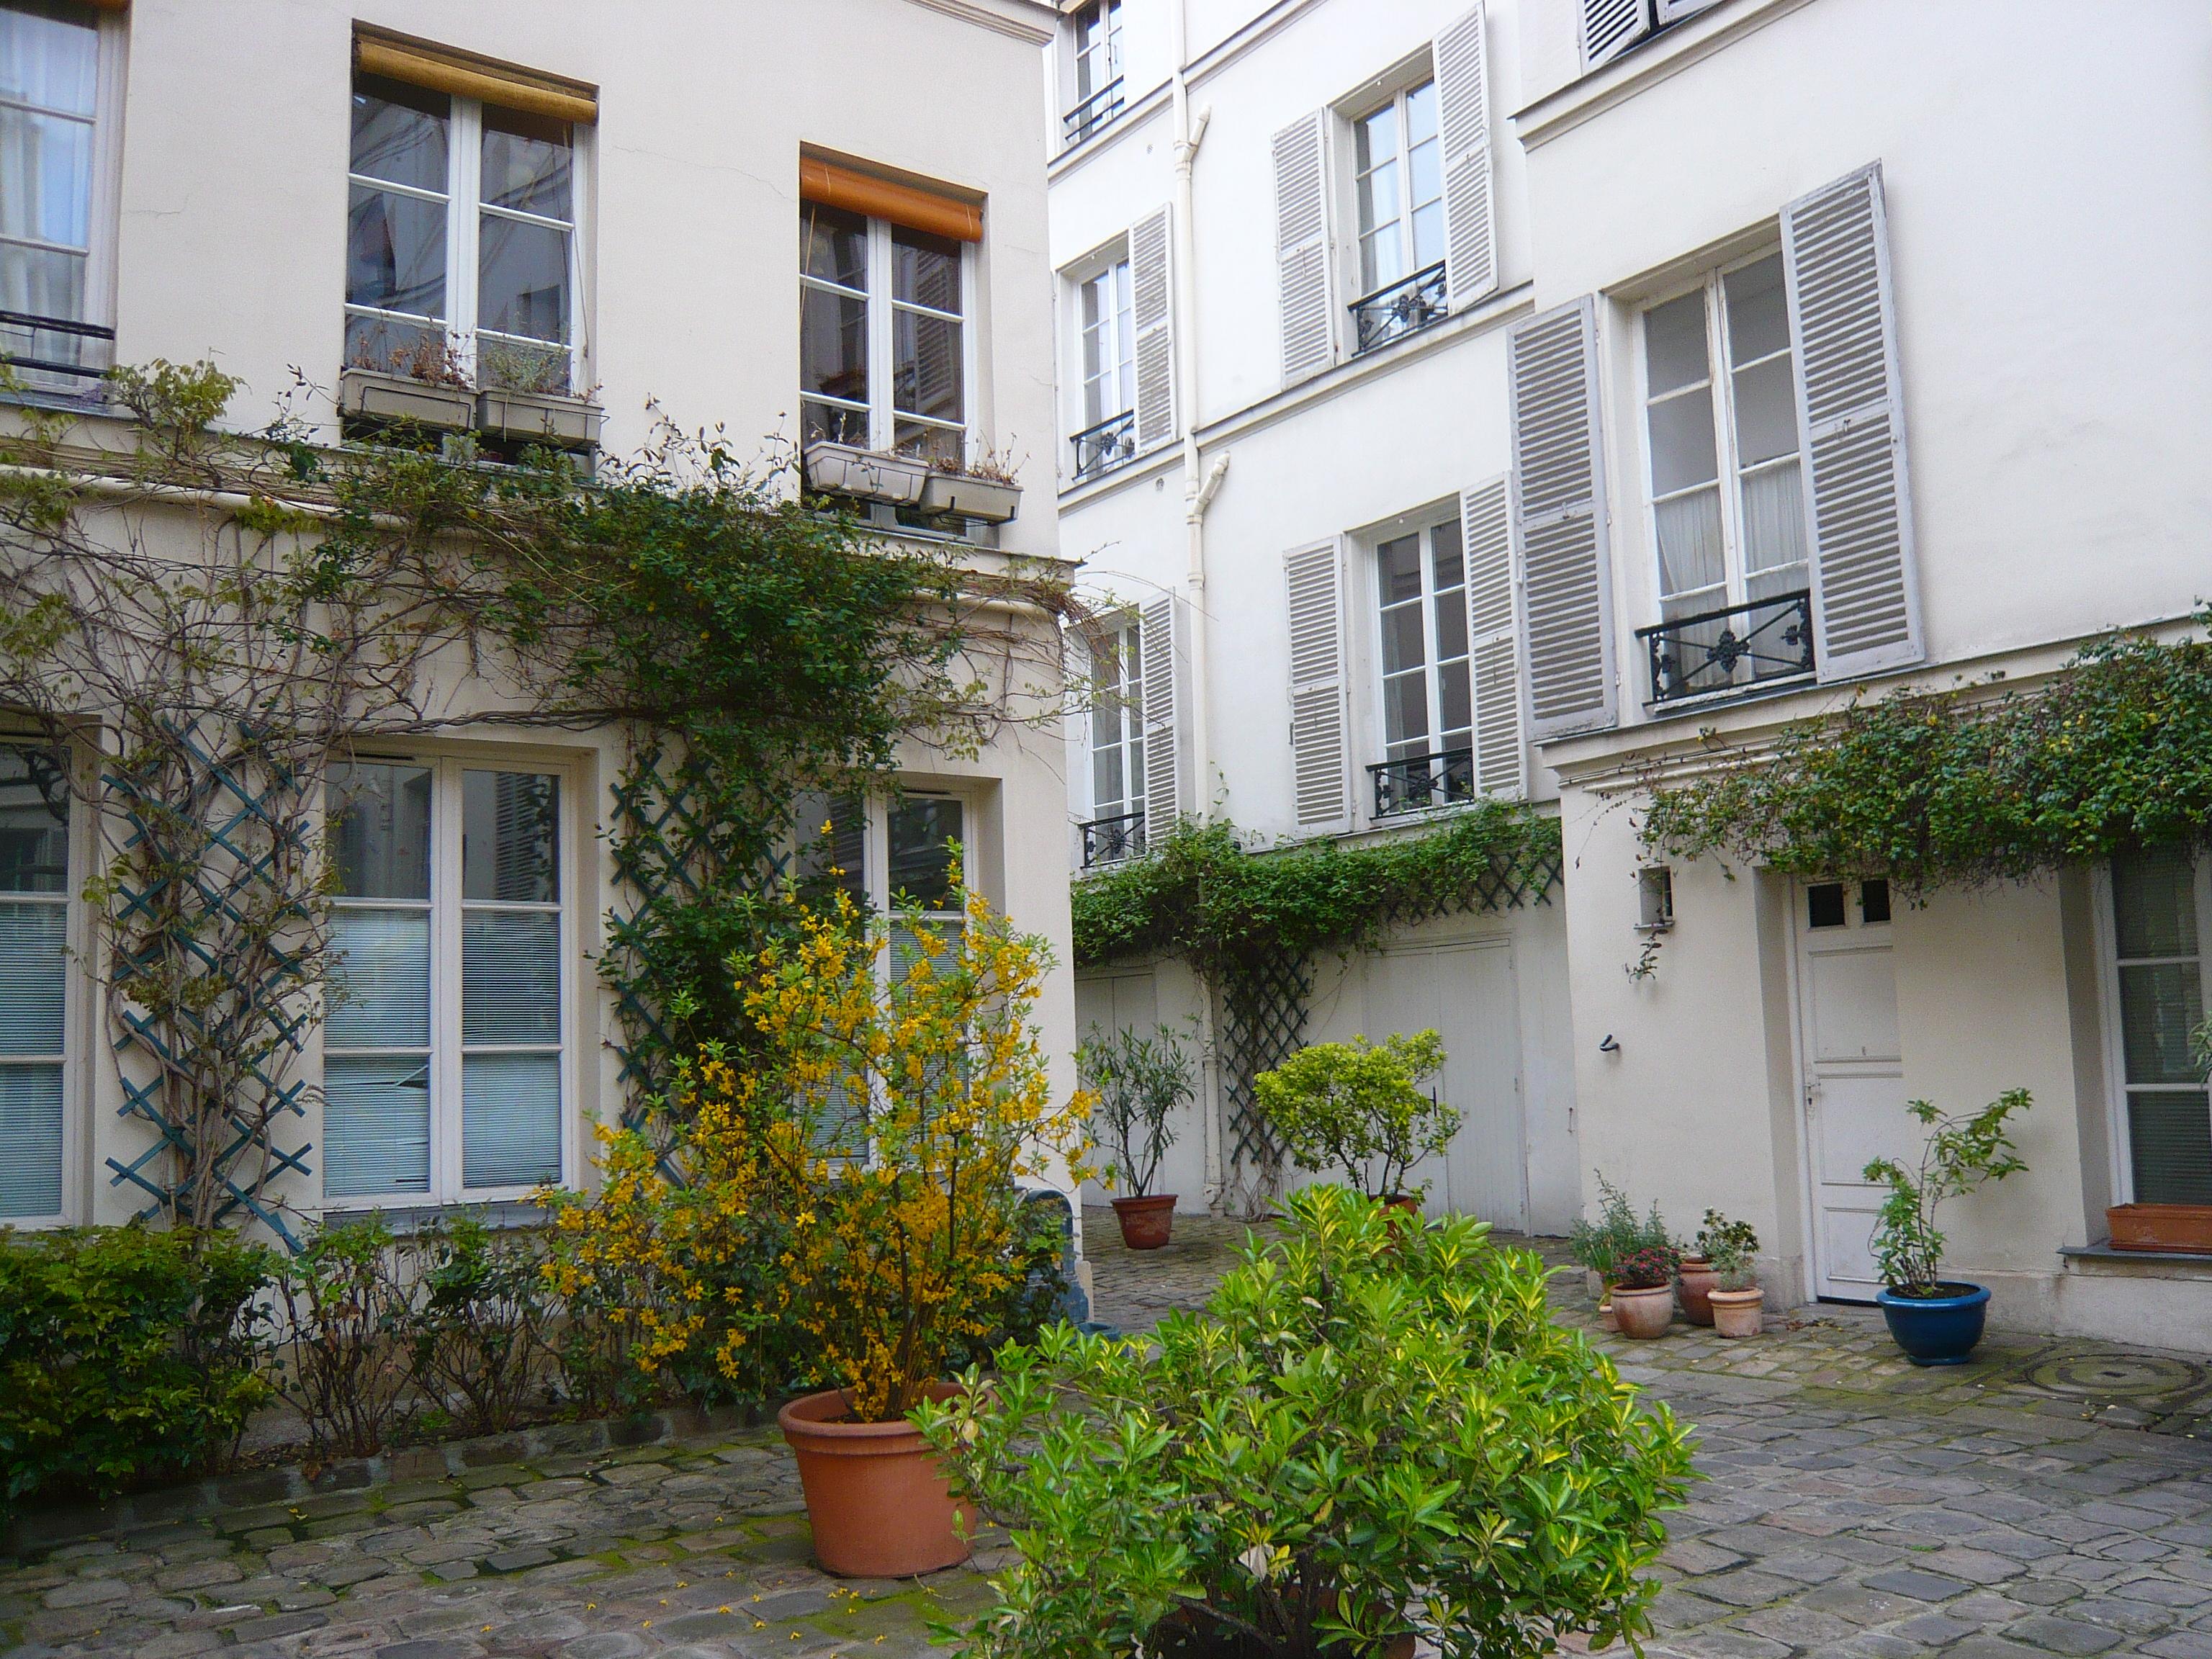 Receipt Slip Sample Apartment Jarente In Paris  France Fr  Interhome Teller Receipts Excel with Online Invoicing Uk Pdf  Invoice Solutions Excel